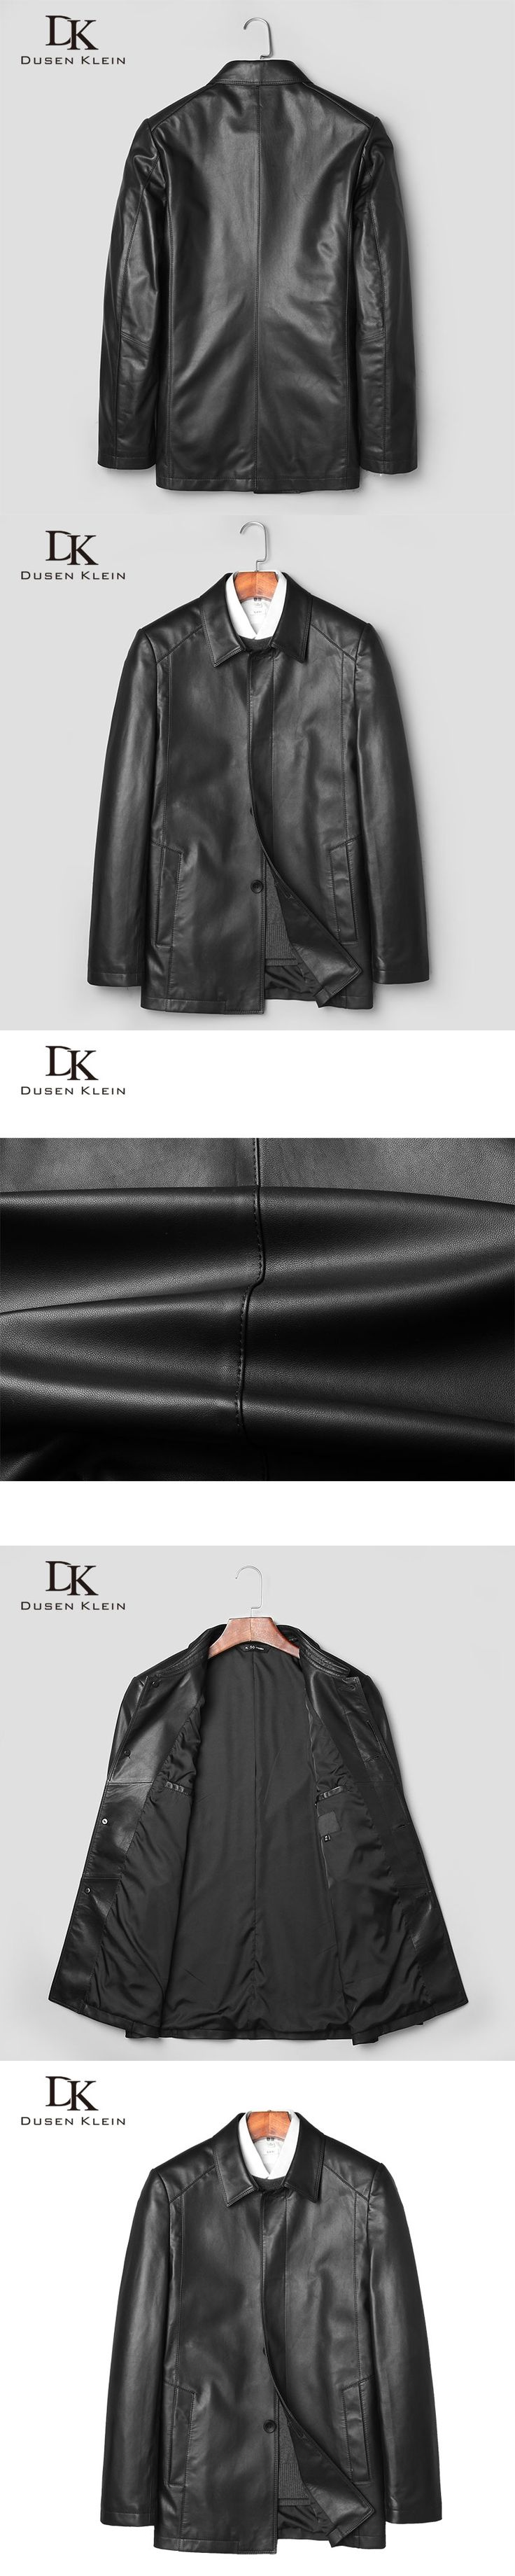 Fashion leather jackets men Dusen Klein New 2017 Genuine sheepskin Causal/Slim leathe coats for man Design Jacket 71J7827